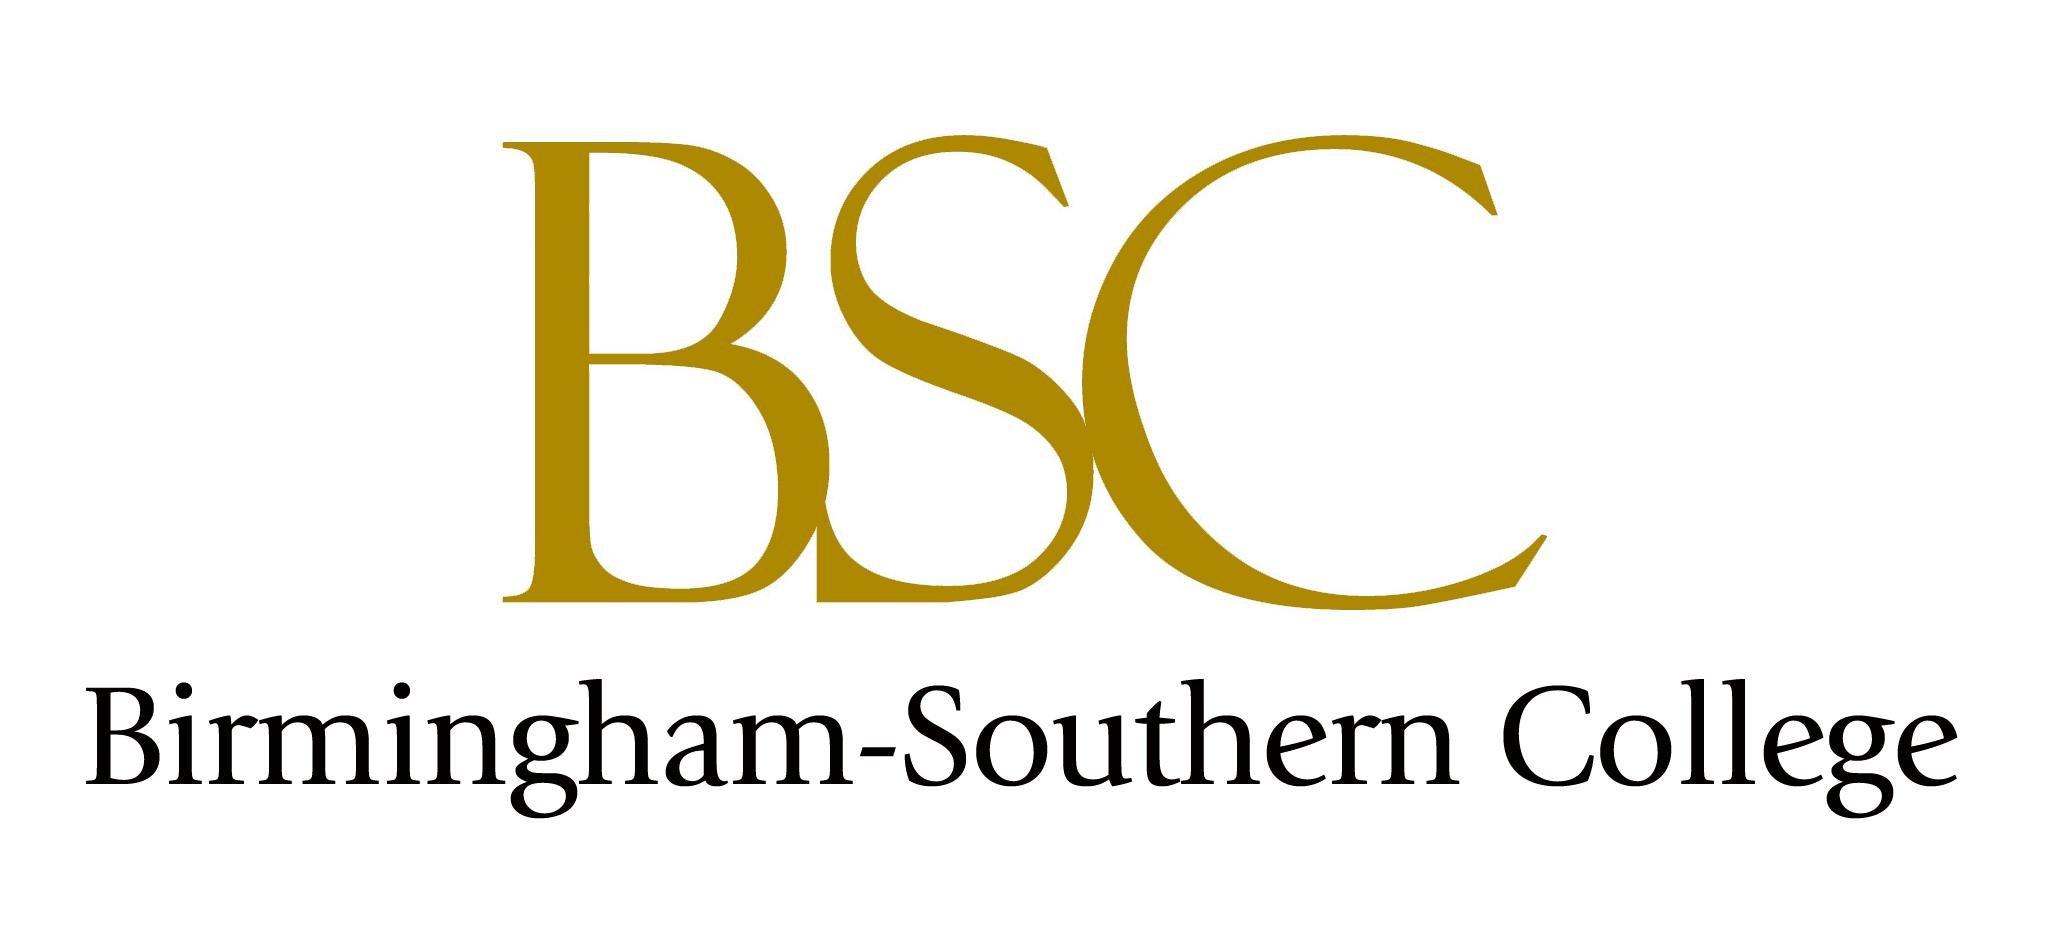 Birmingham-Southern College Film & Media Studies